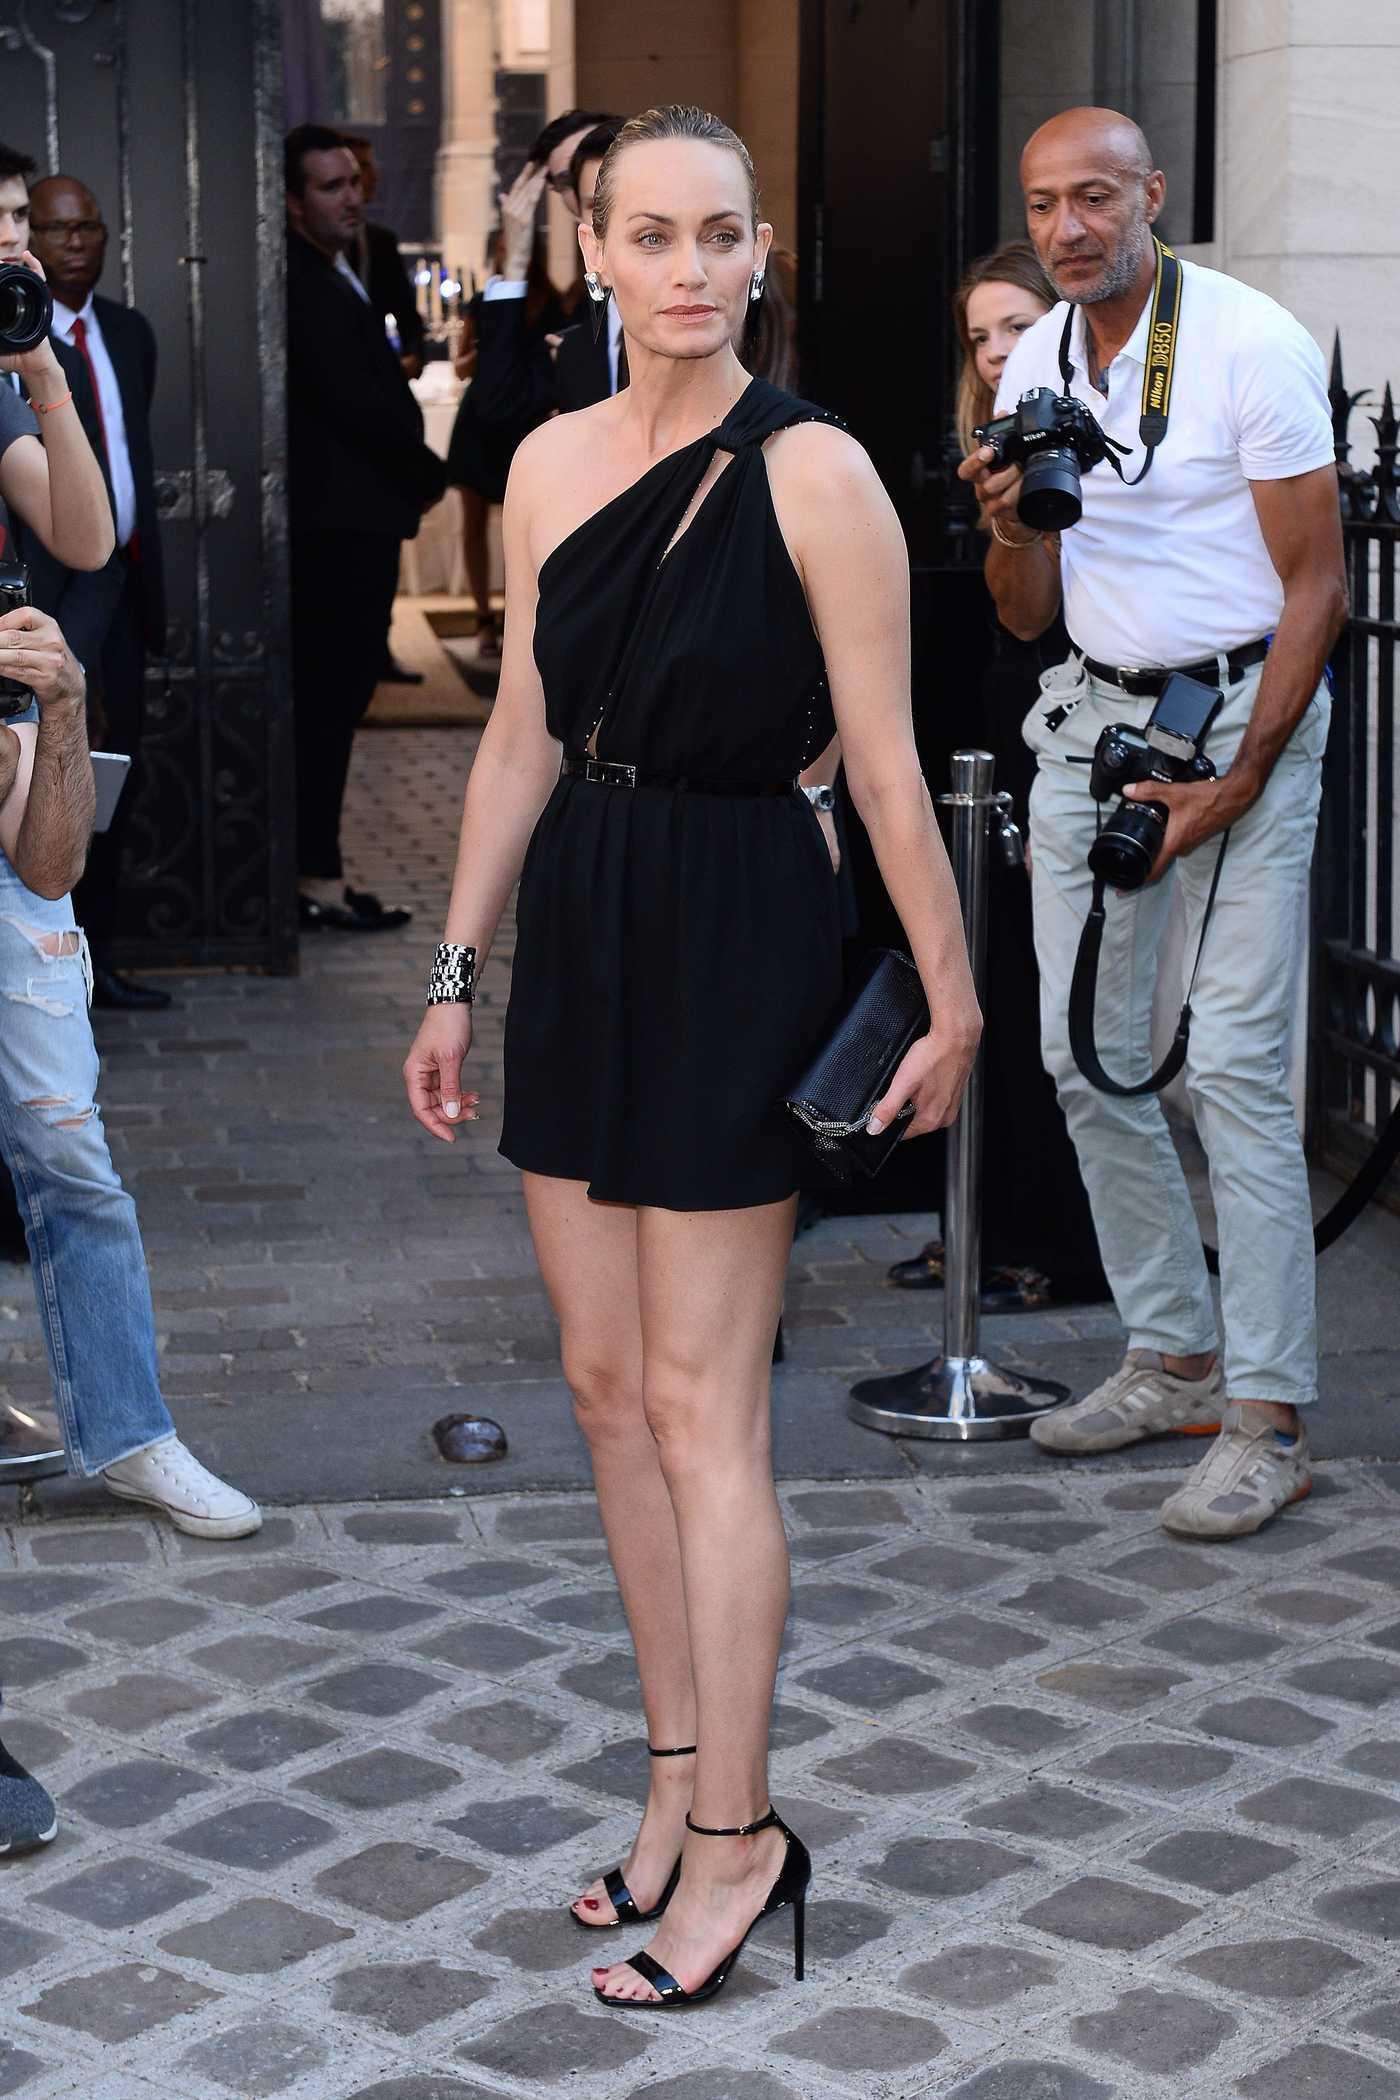 Amber Valletta Attends 2018 Vogue Foundation Dinner at Palais Galleria in Paris 07/03/2018